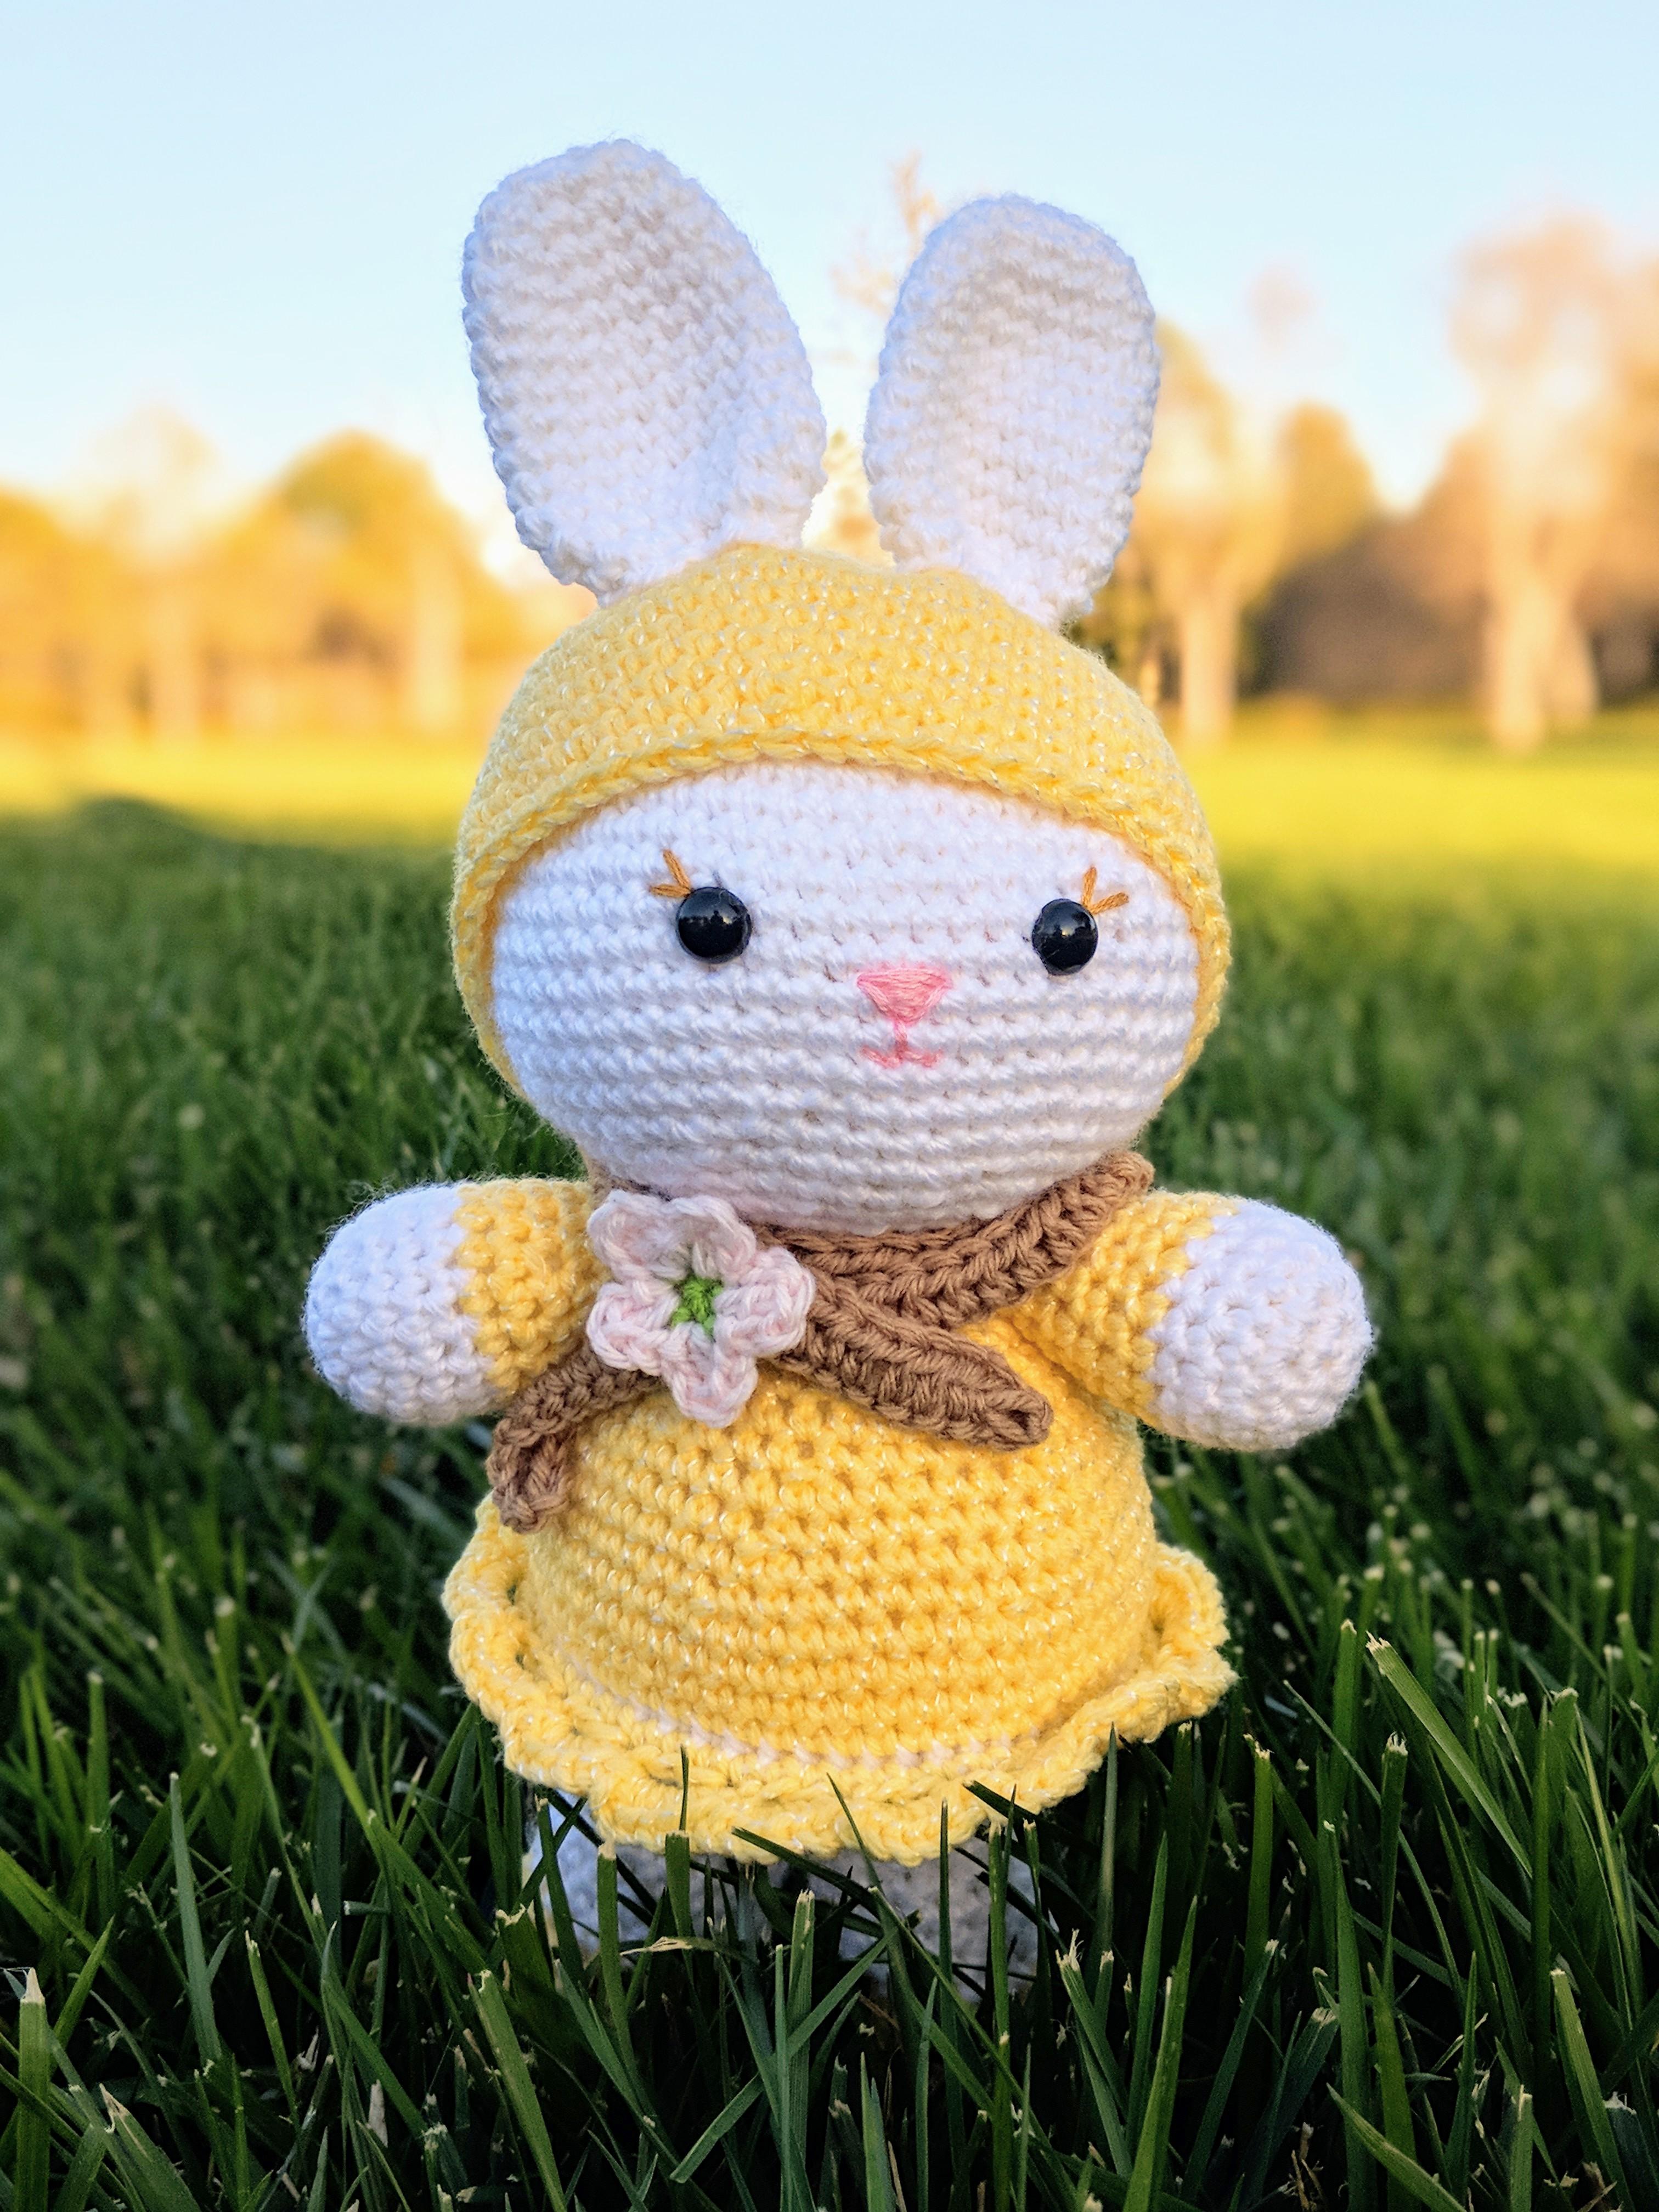 Crochet Cute Bunny Rabbit Amigurumi - YouTube | 4032x3024